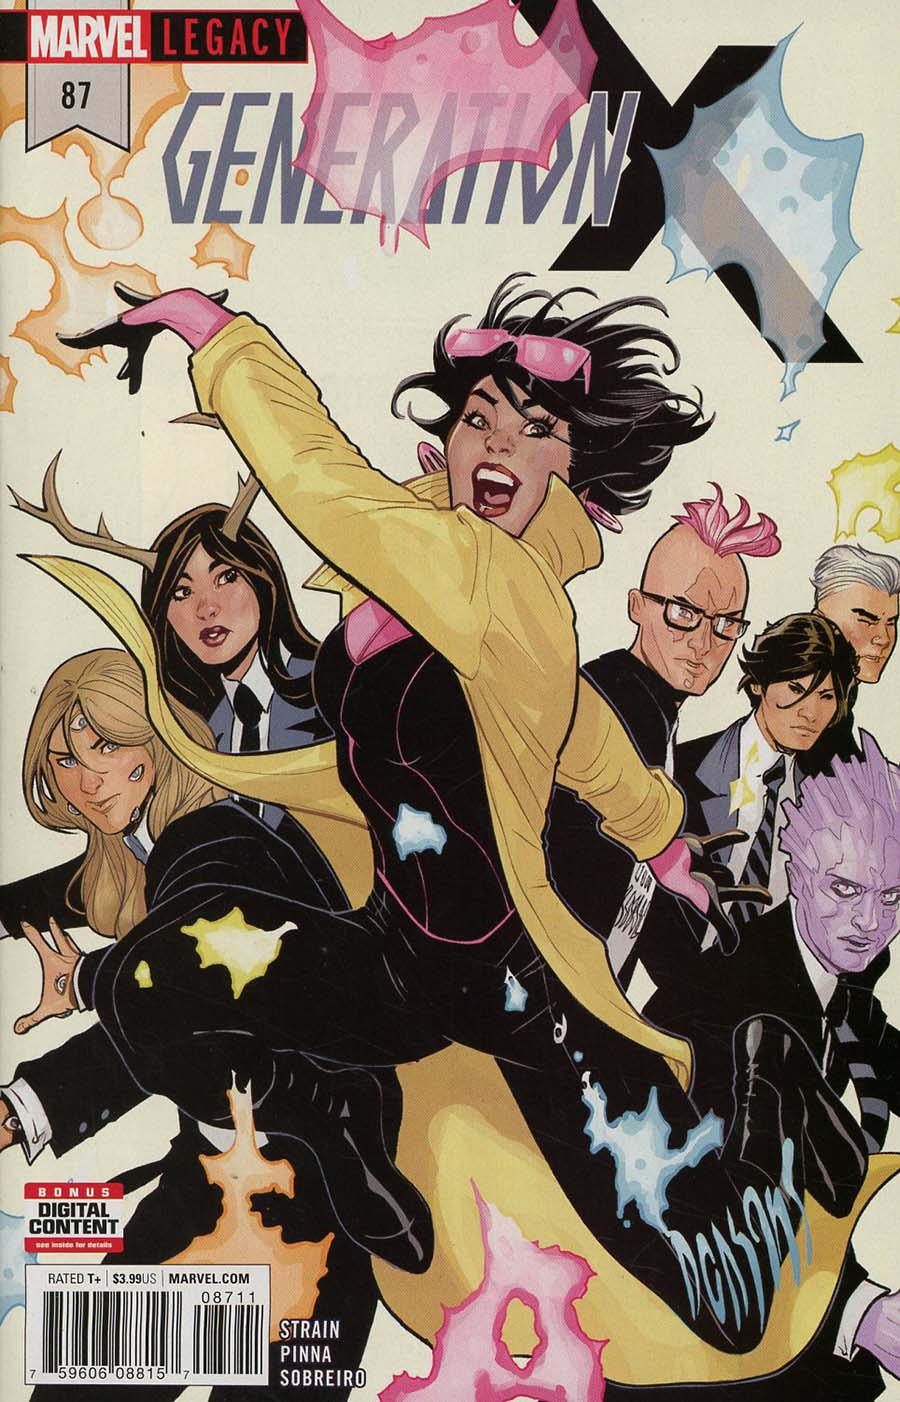 Generation X Vol 2 #87 (Marvel Legacy Tie-In)